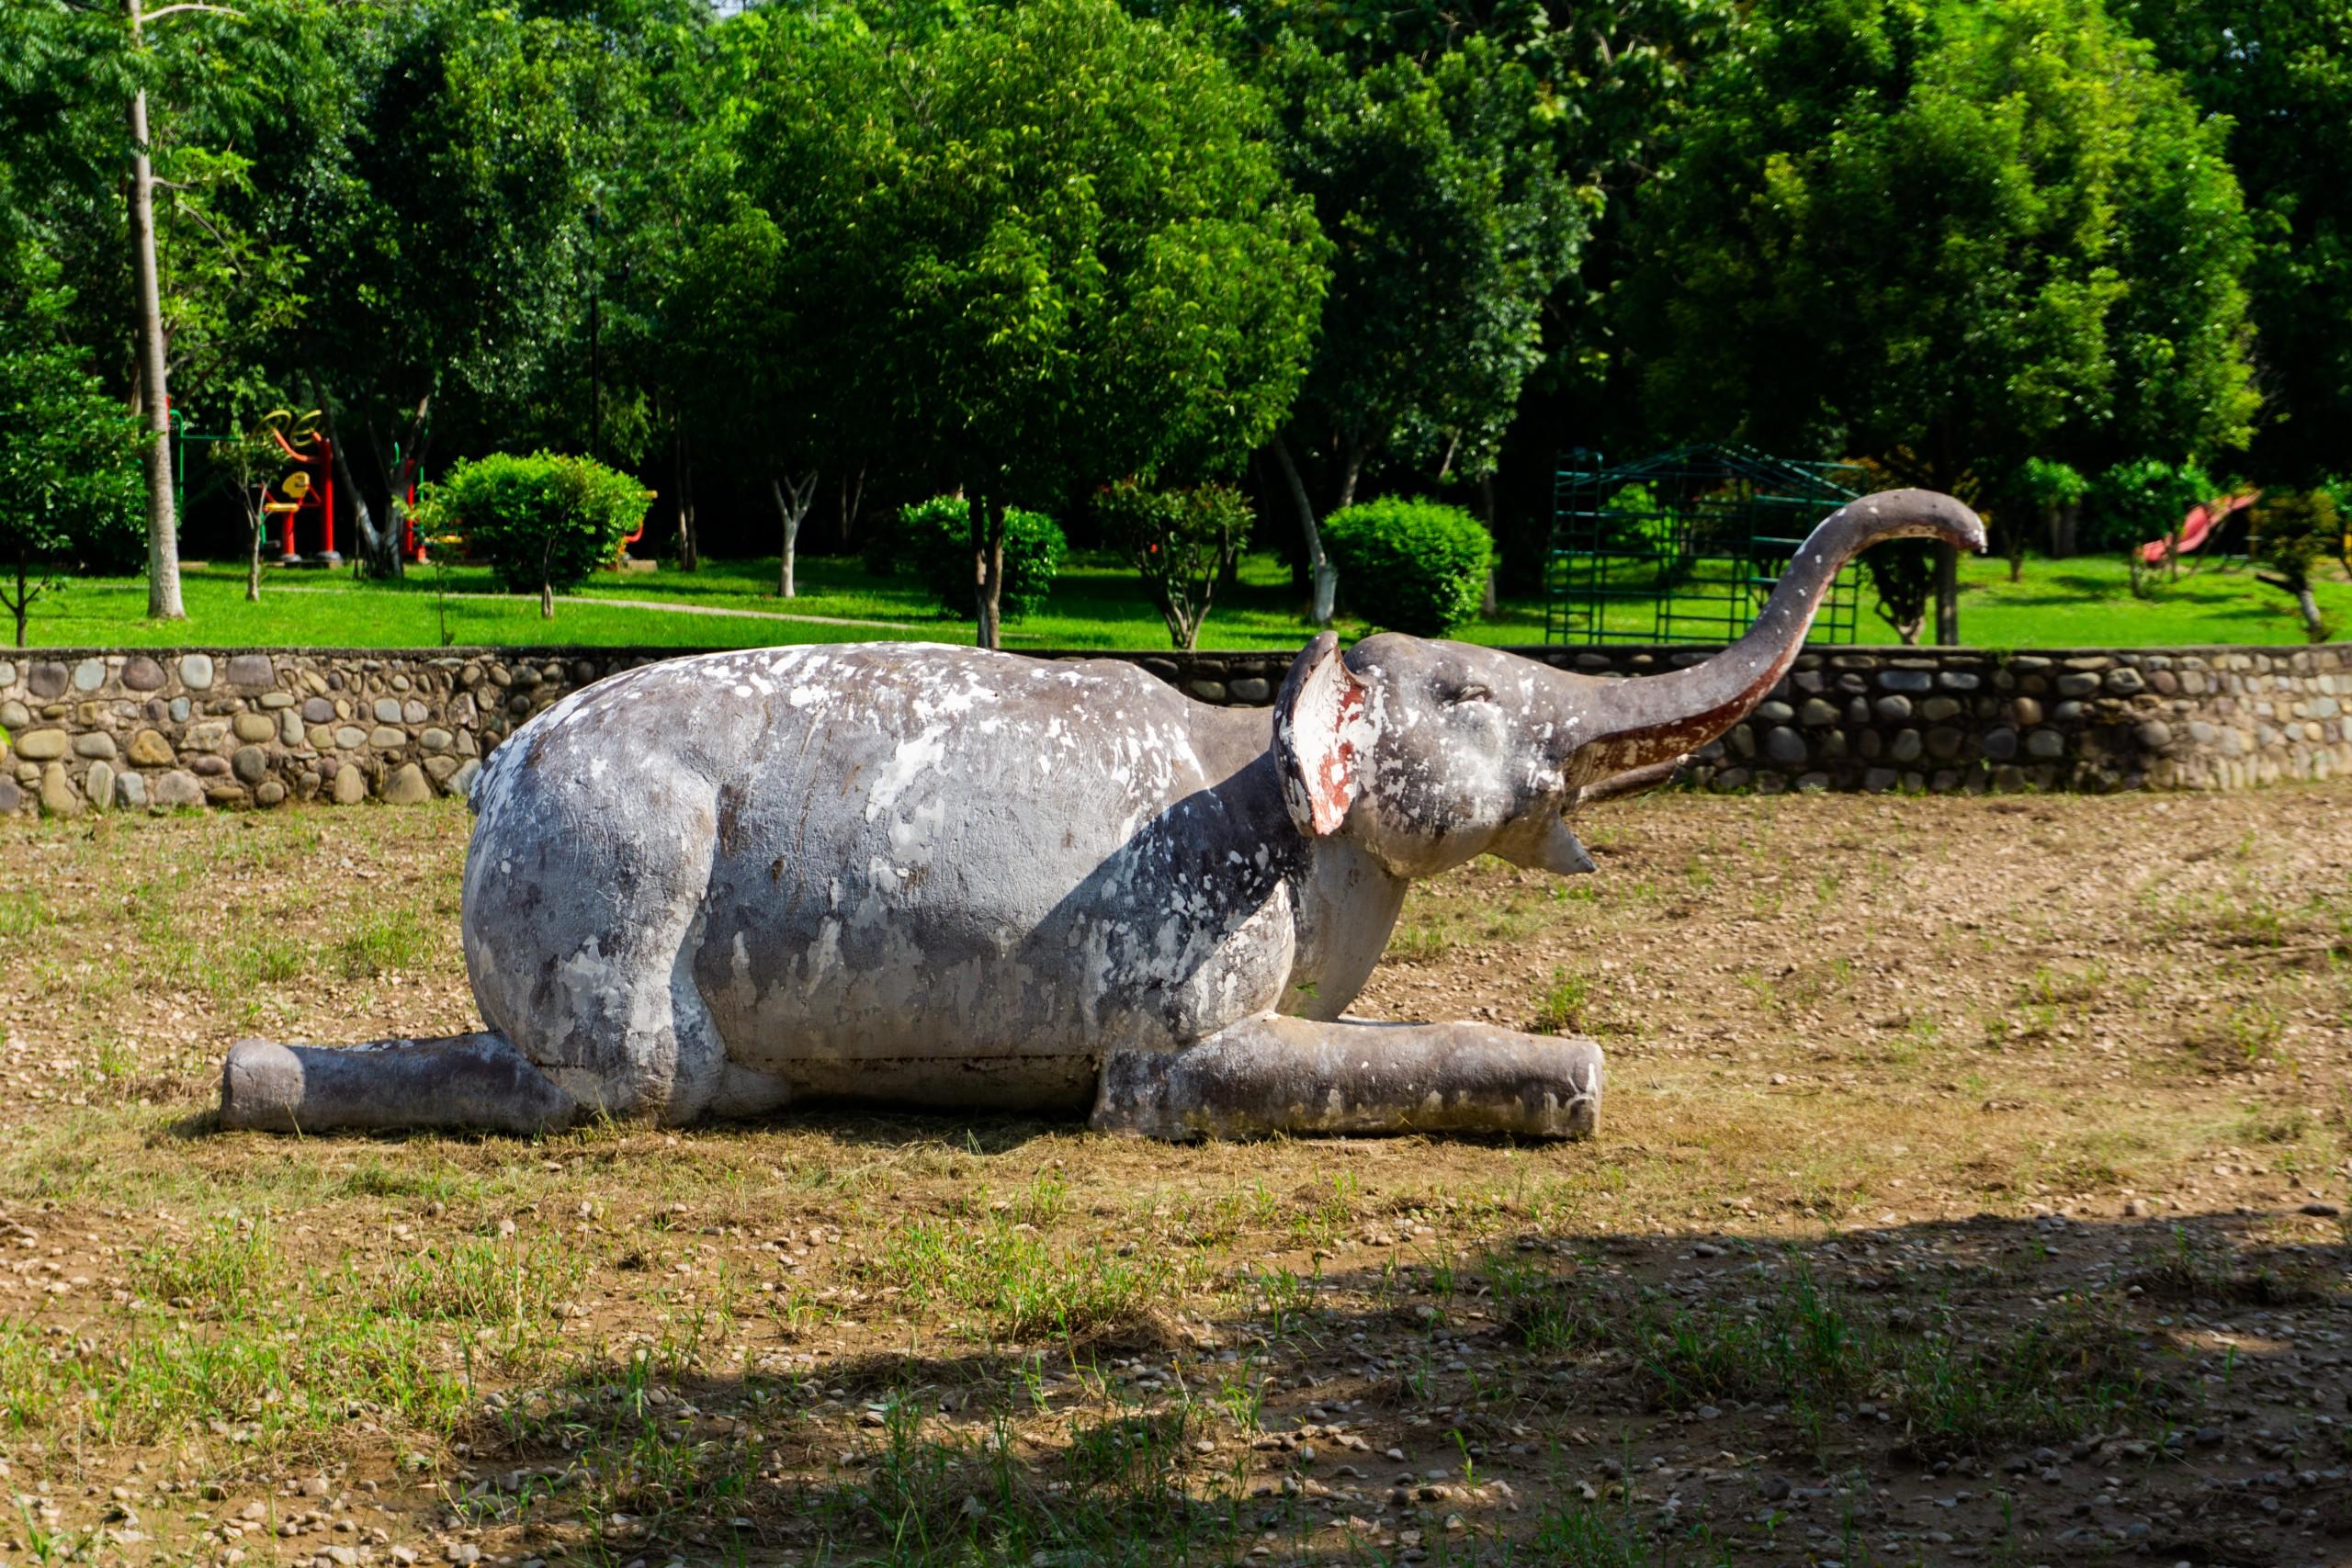 Elephant Sculpture craft